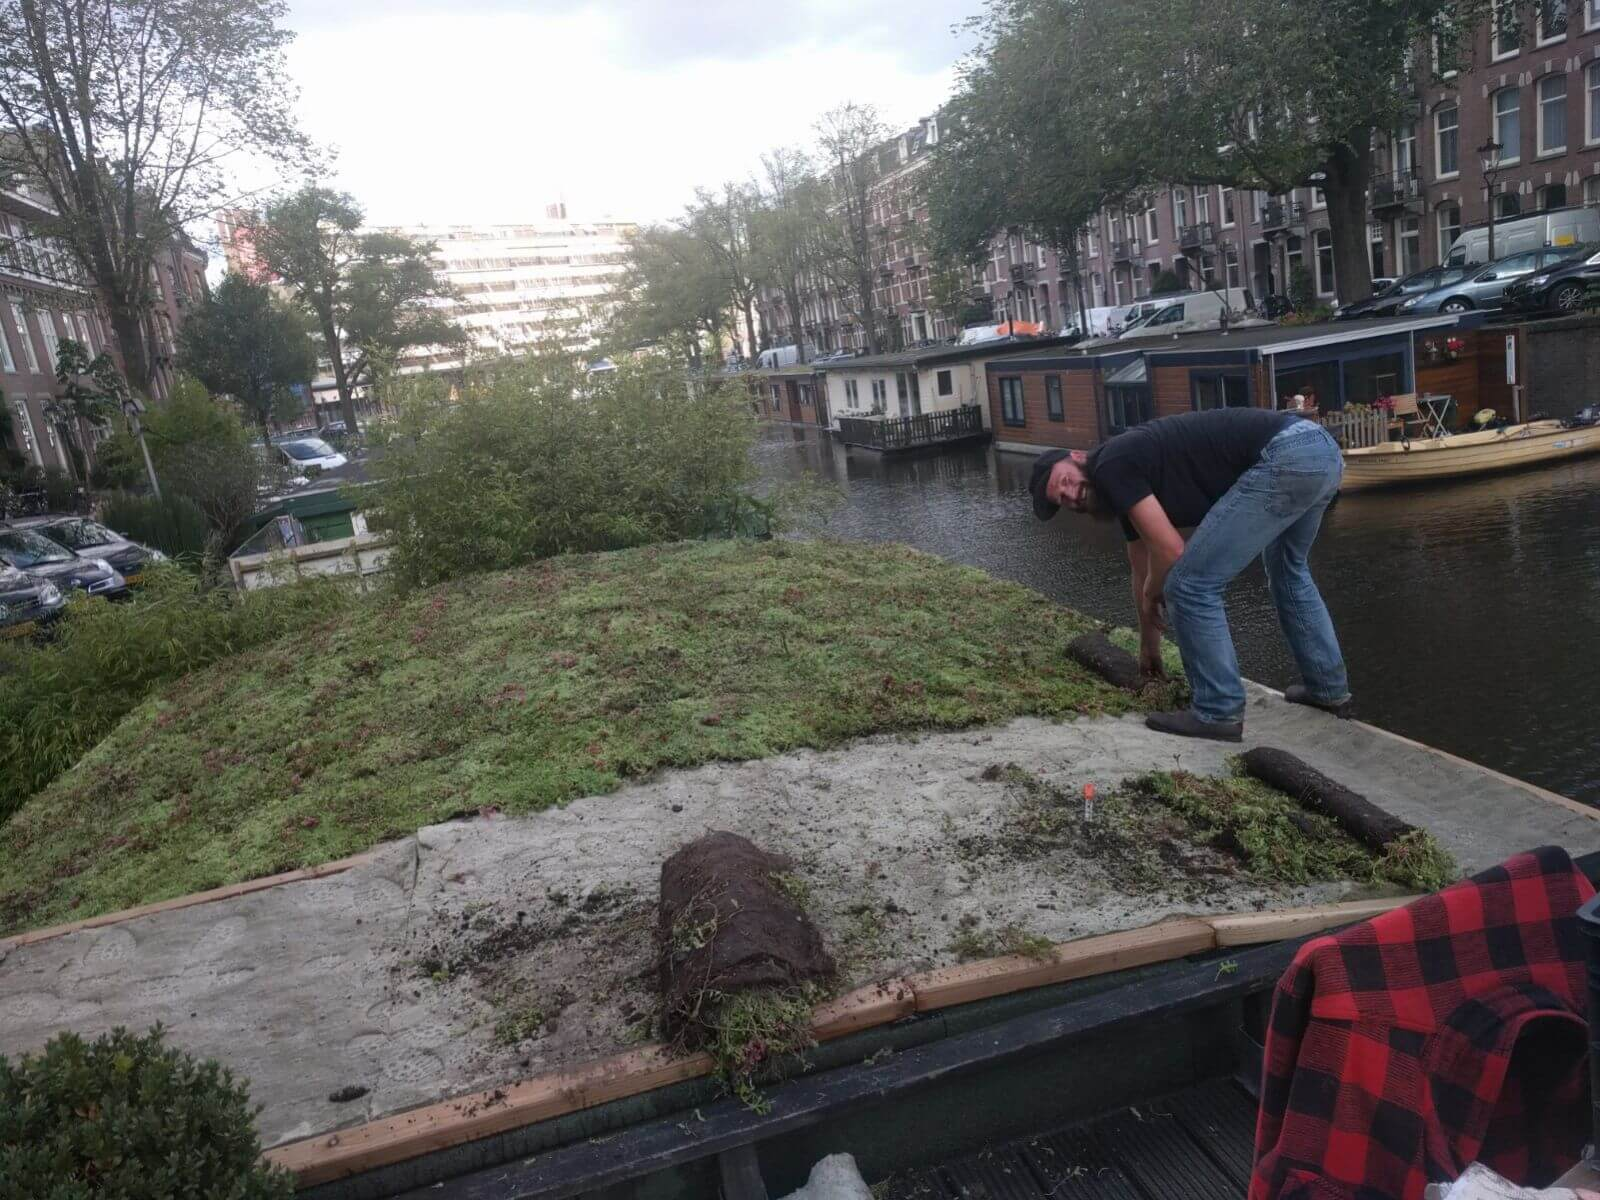 Sedum roof houseboat - do it yourself